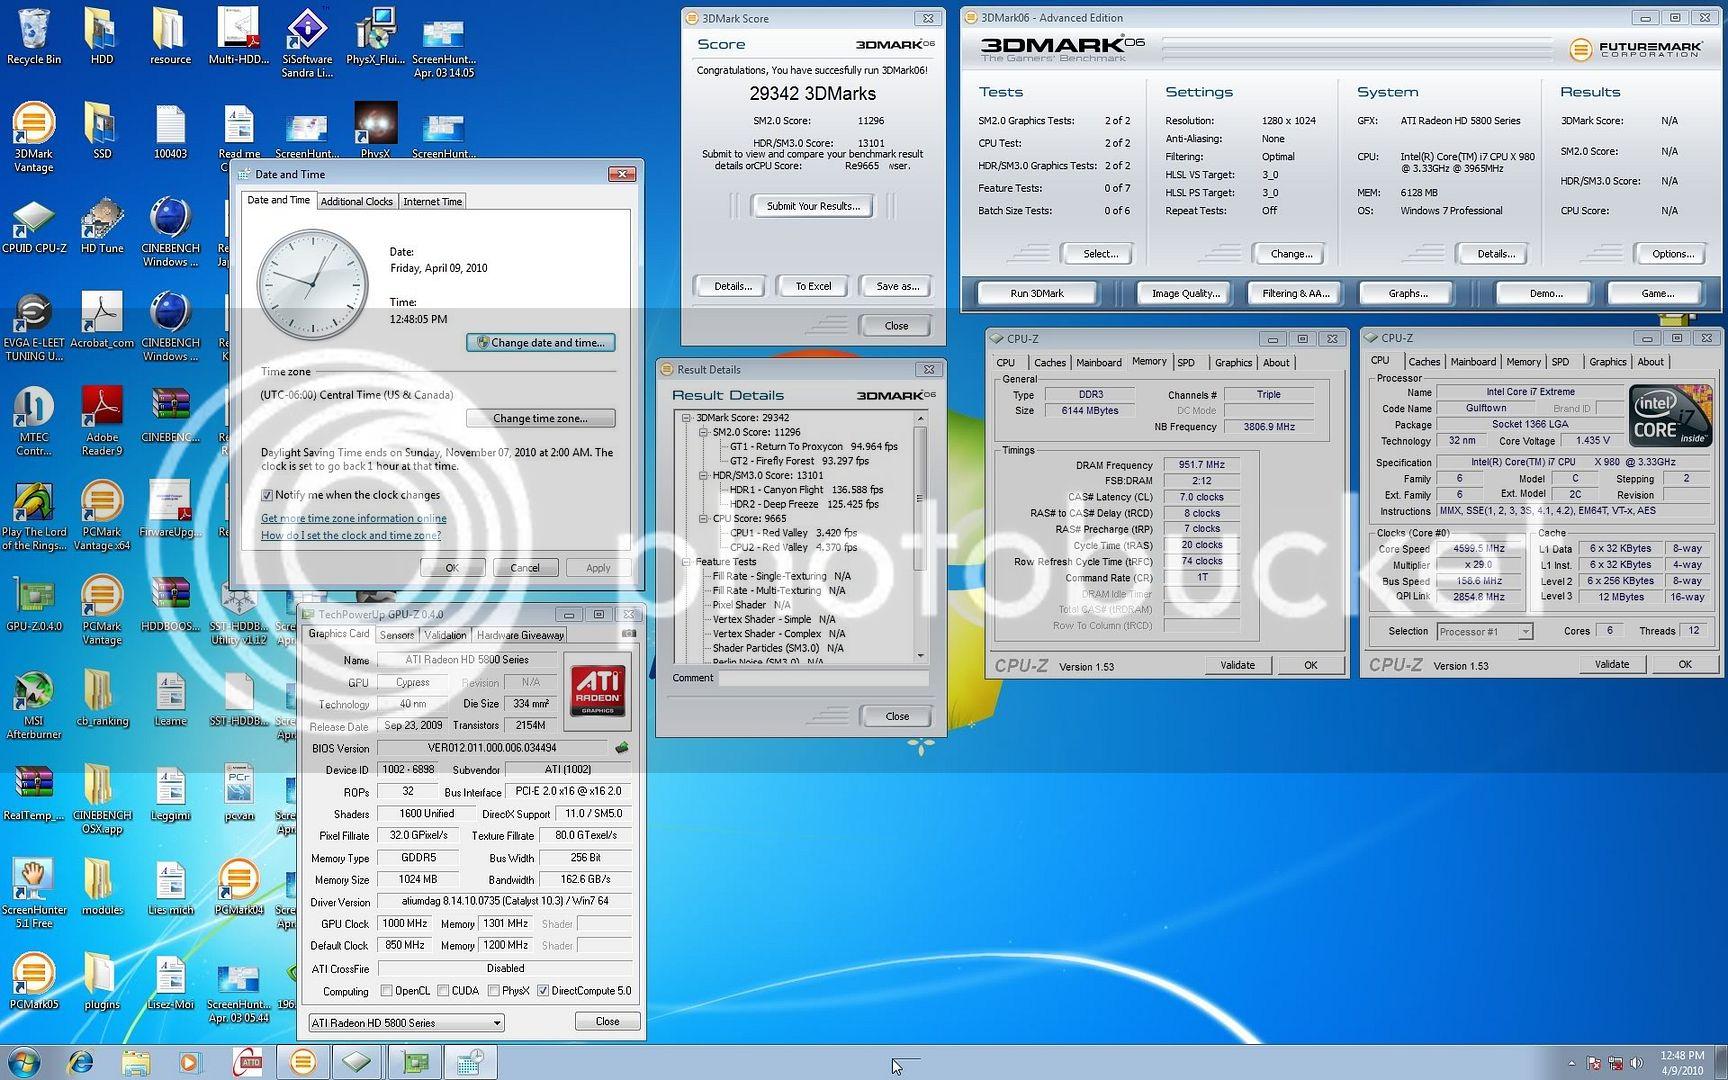 intel i7 980x overclocking guide